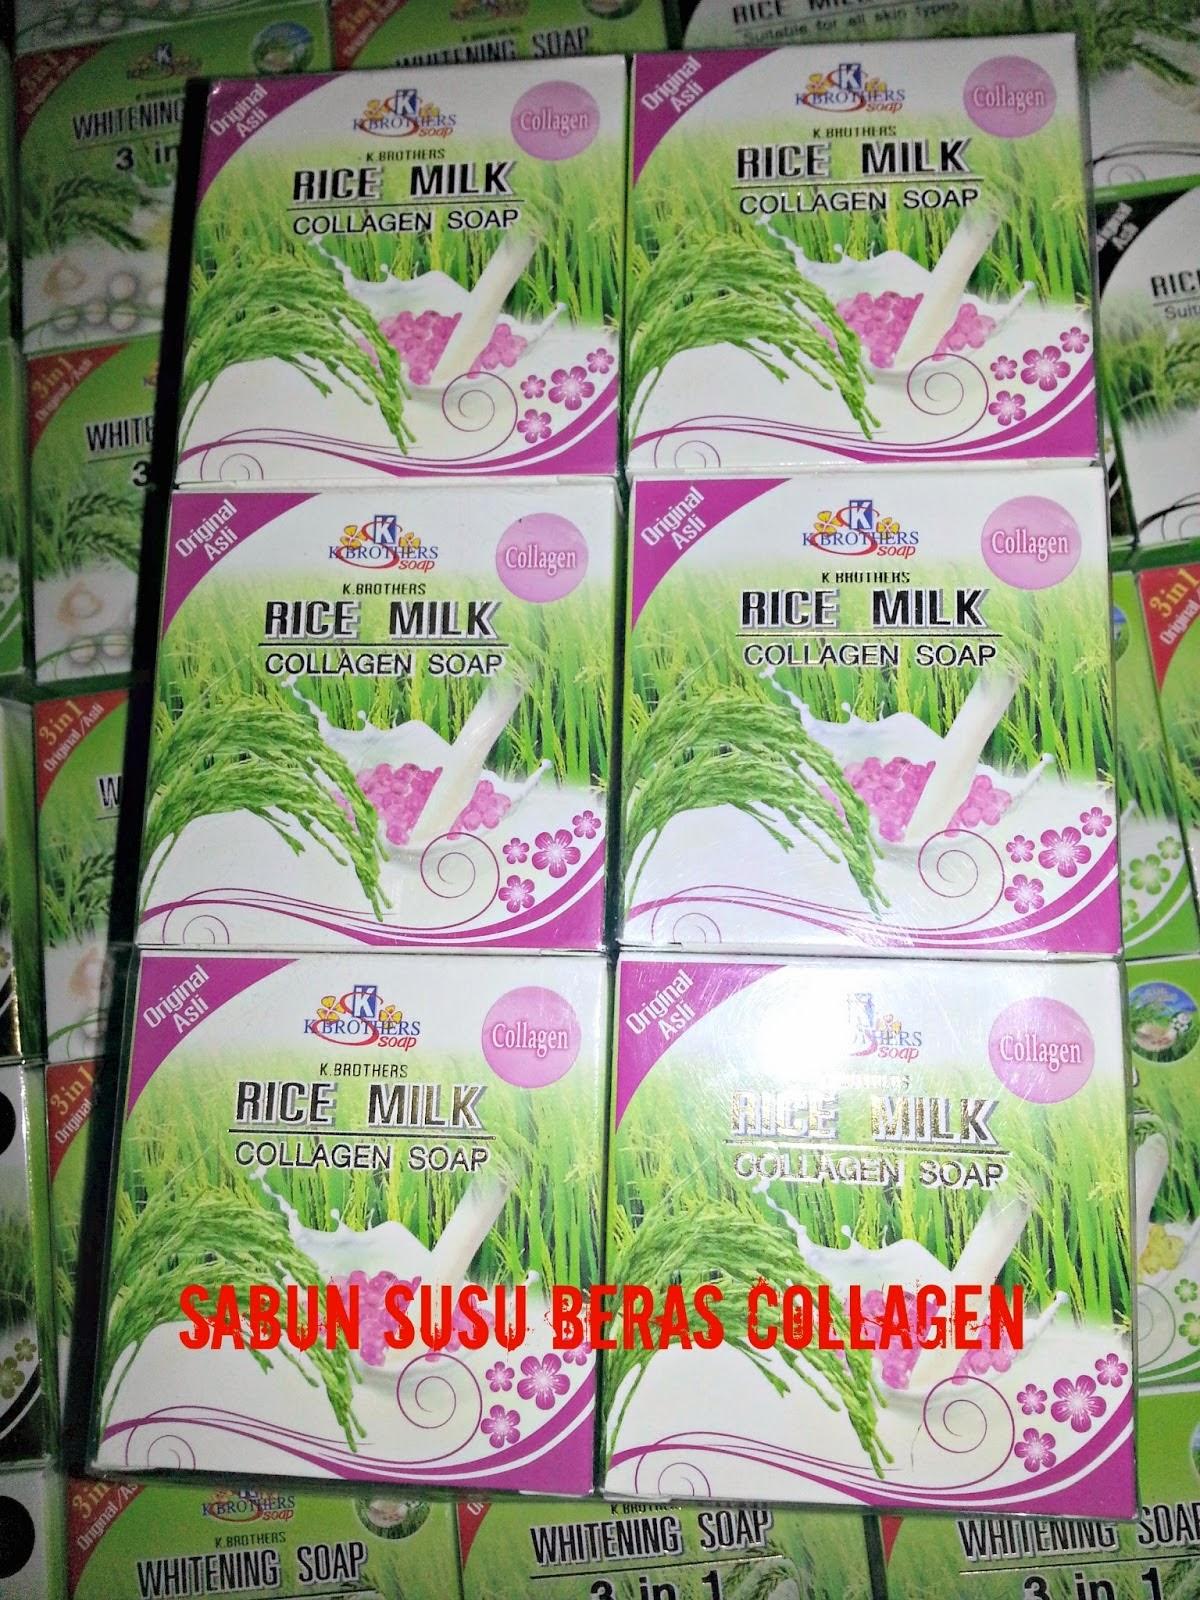 Acu Tnc Produk Sabun Susu Beras Collagen K Brothers 2 In 1